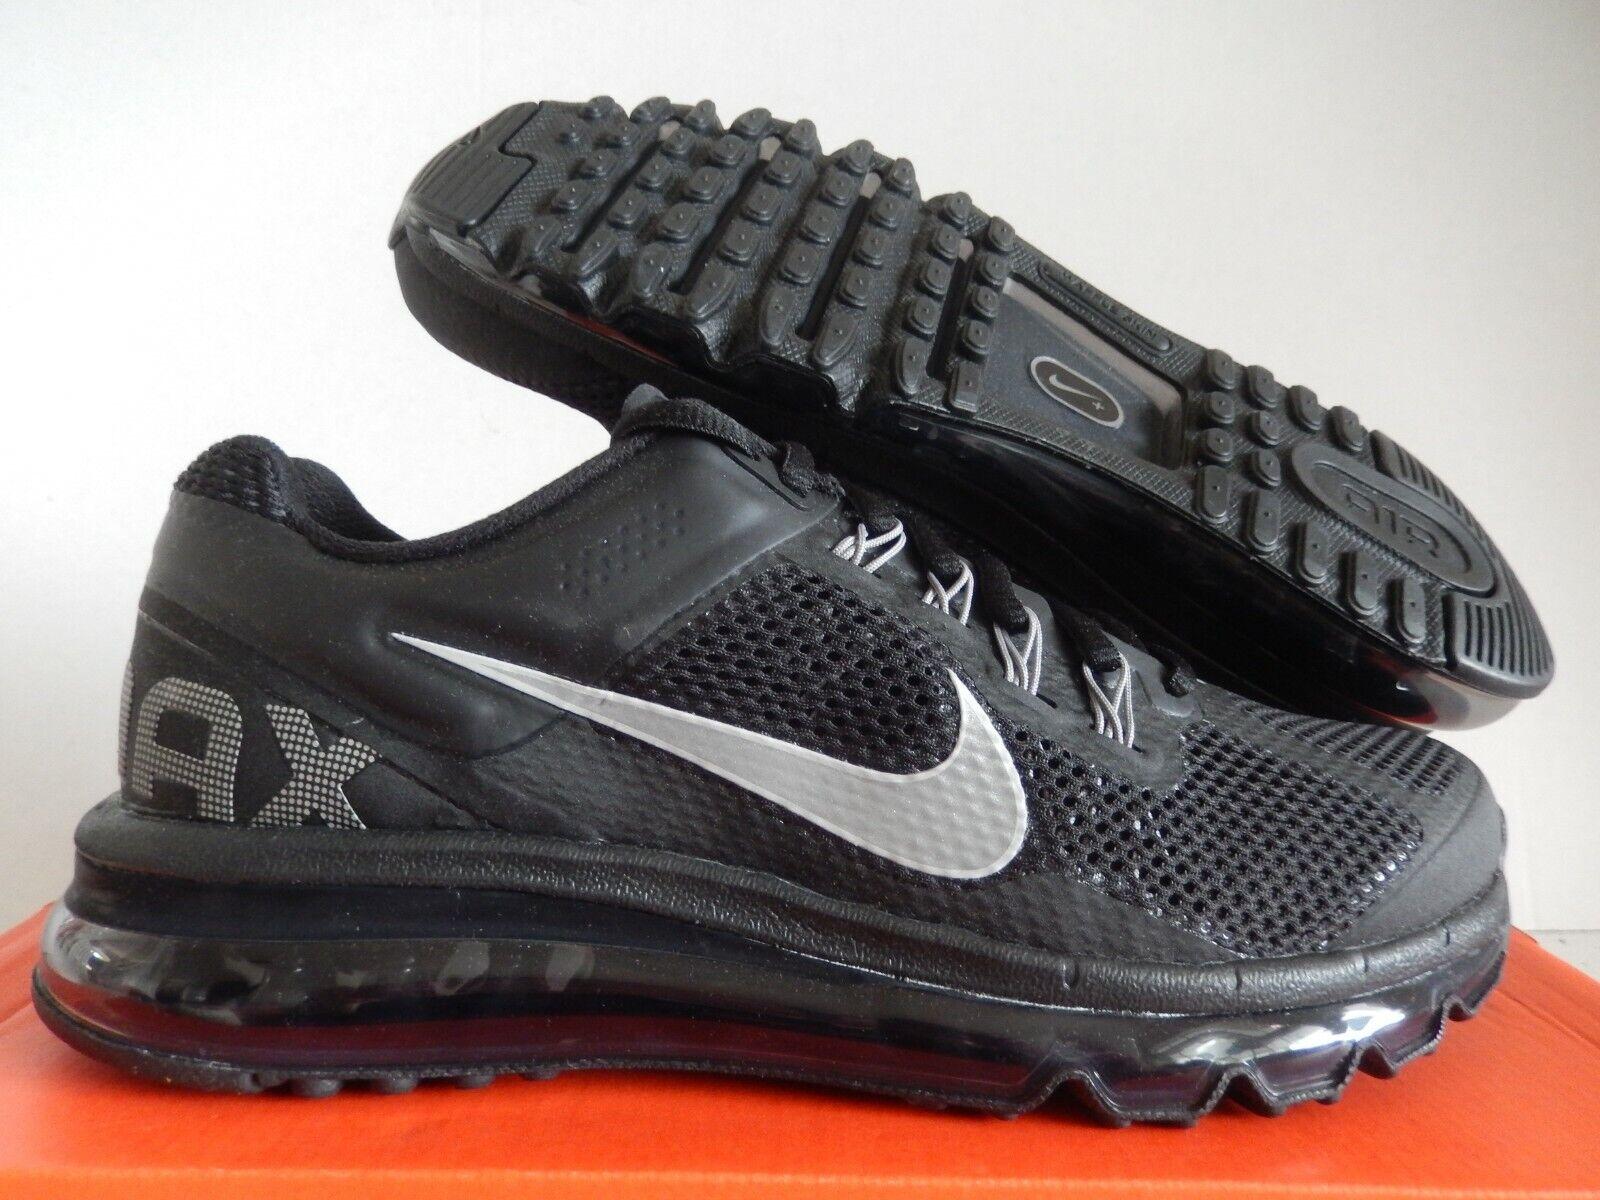 Nike Air Max 2013 Black And Grey